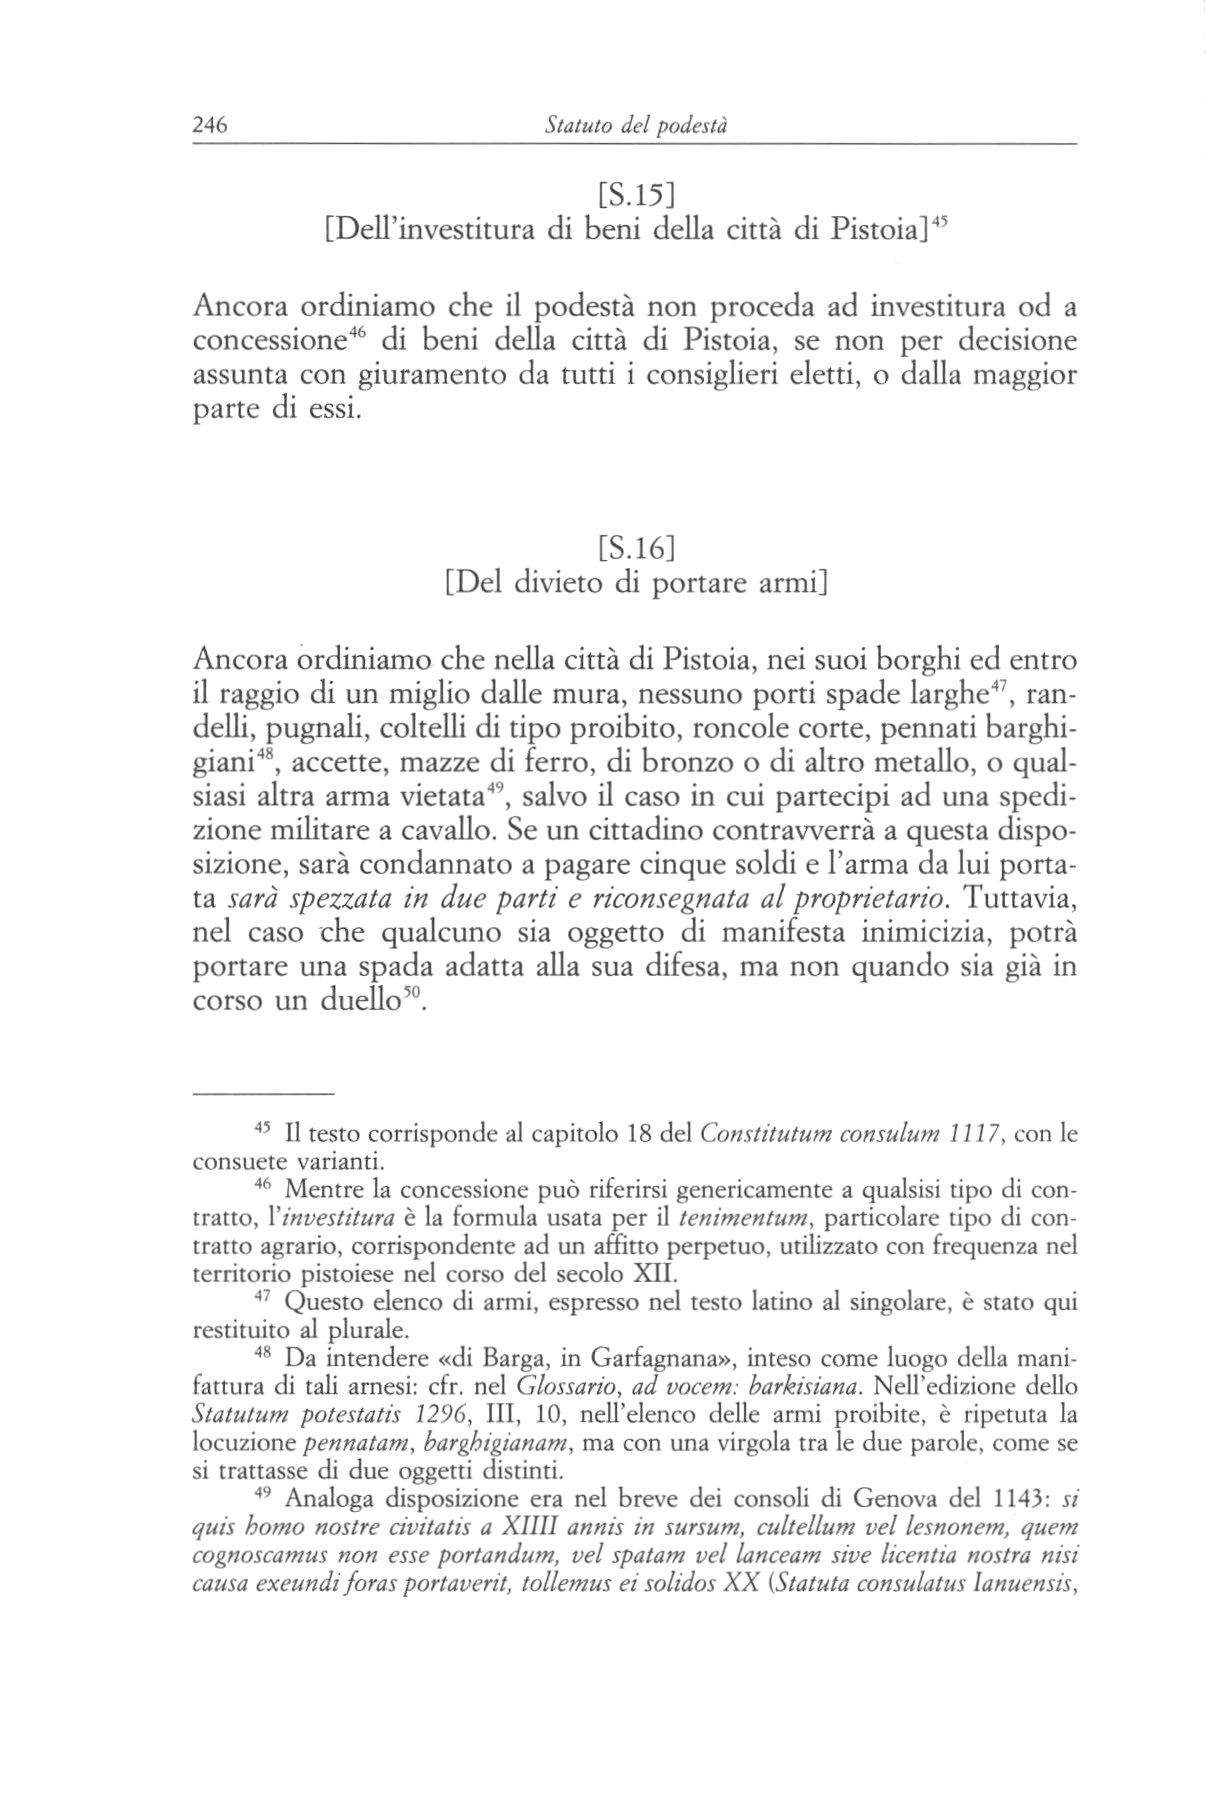 statuti pistoiesi del sec.XII 0246.jpg